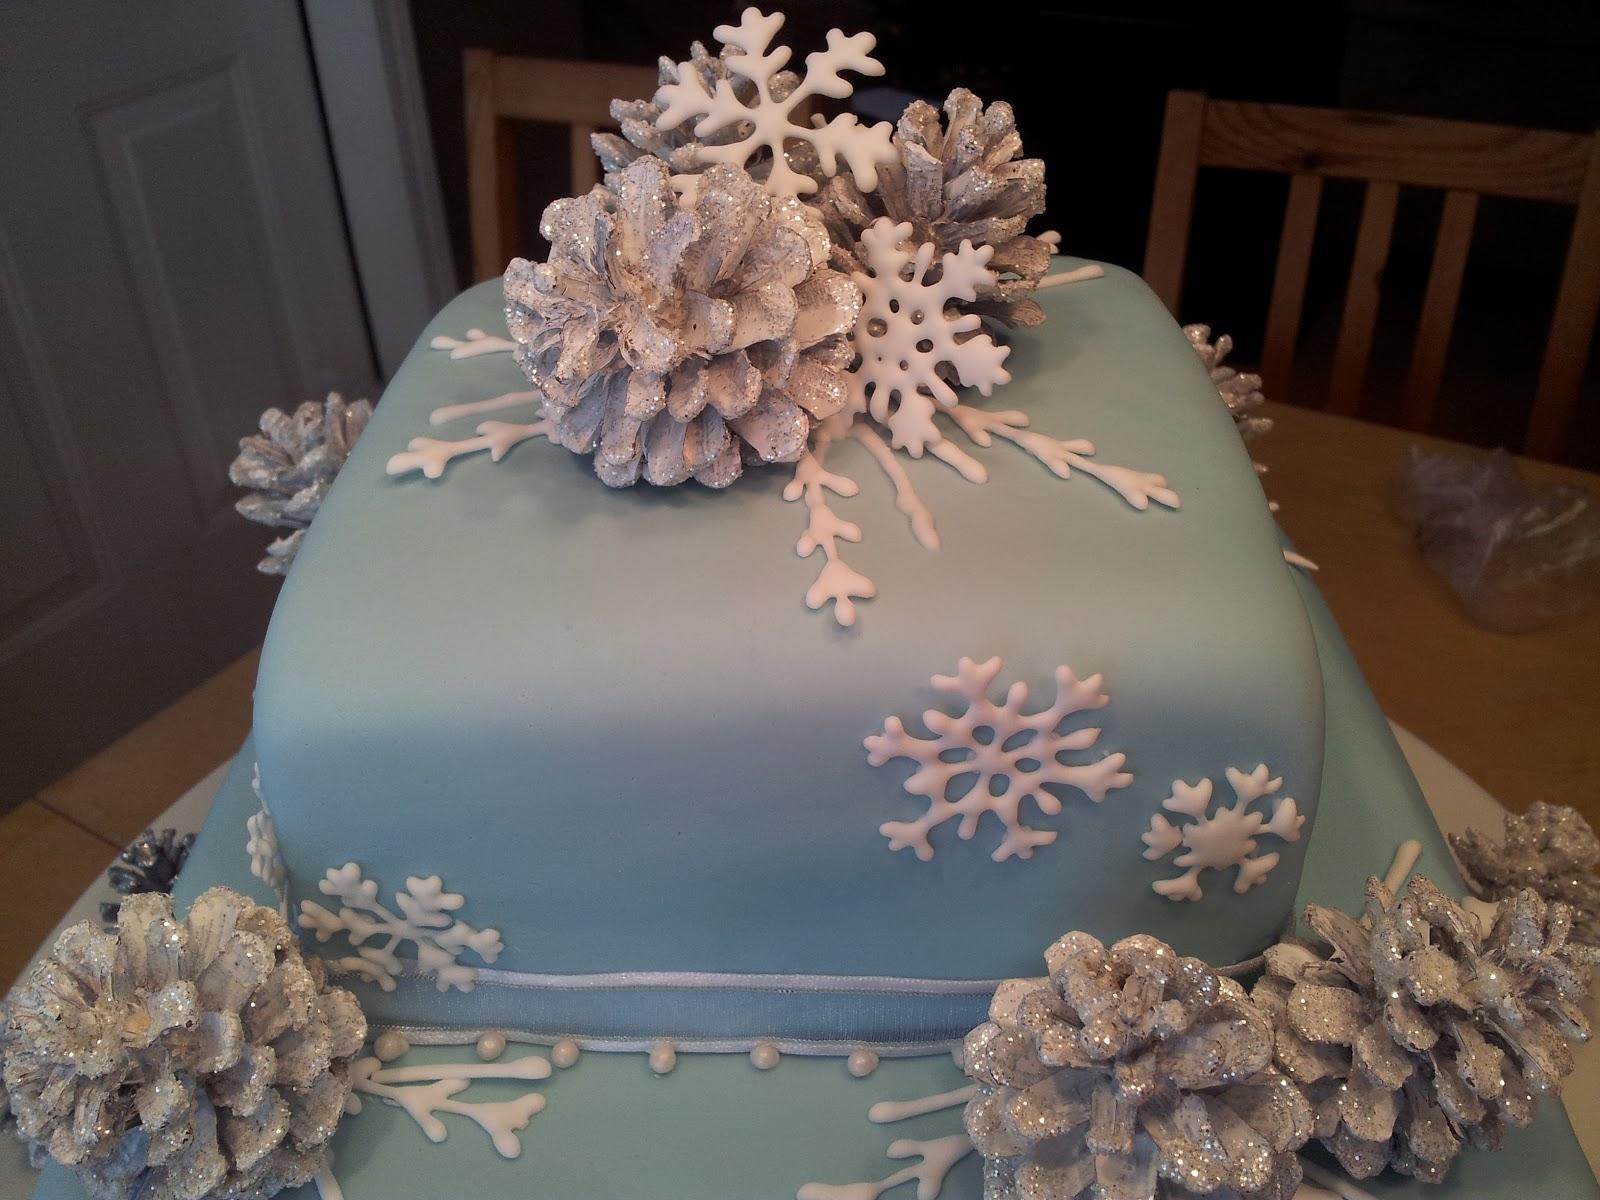 Kiddles 'N Bits: Winter Wonderland Wedding Cake